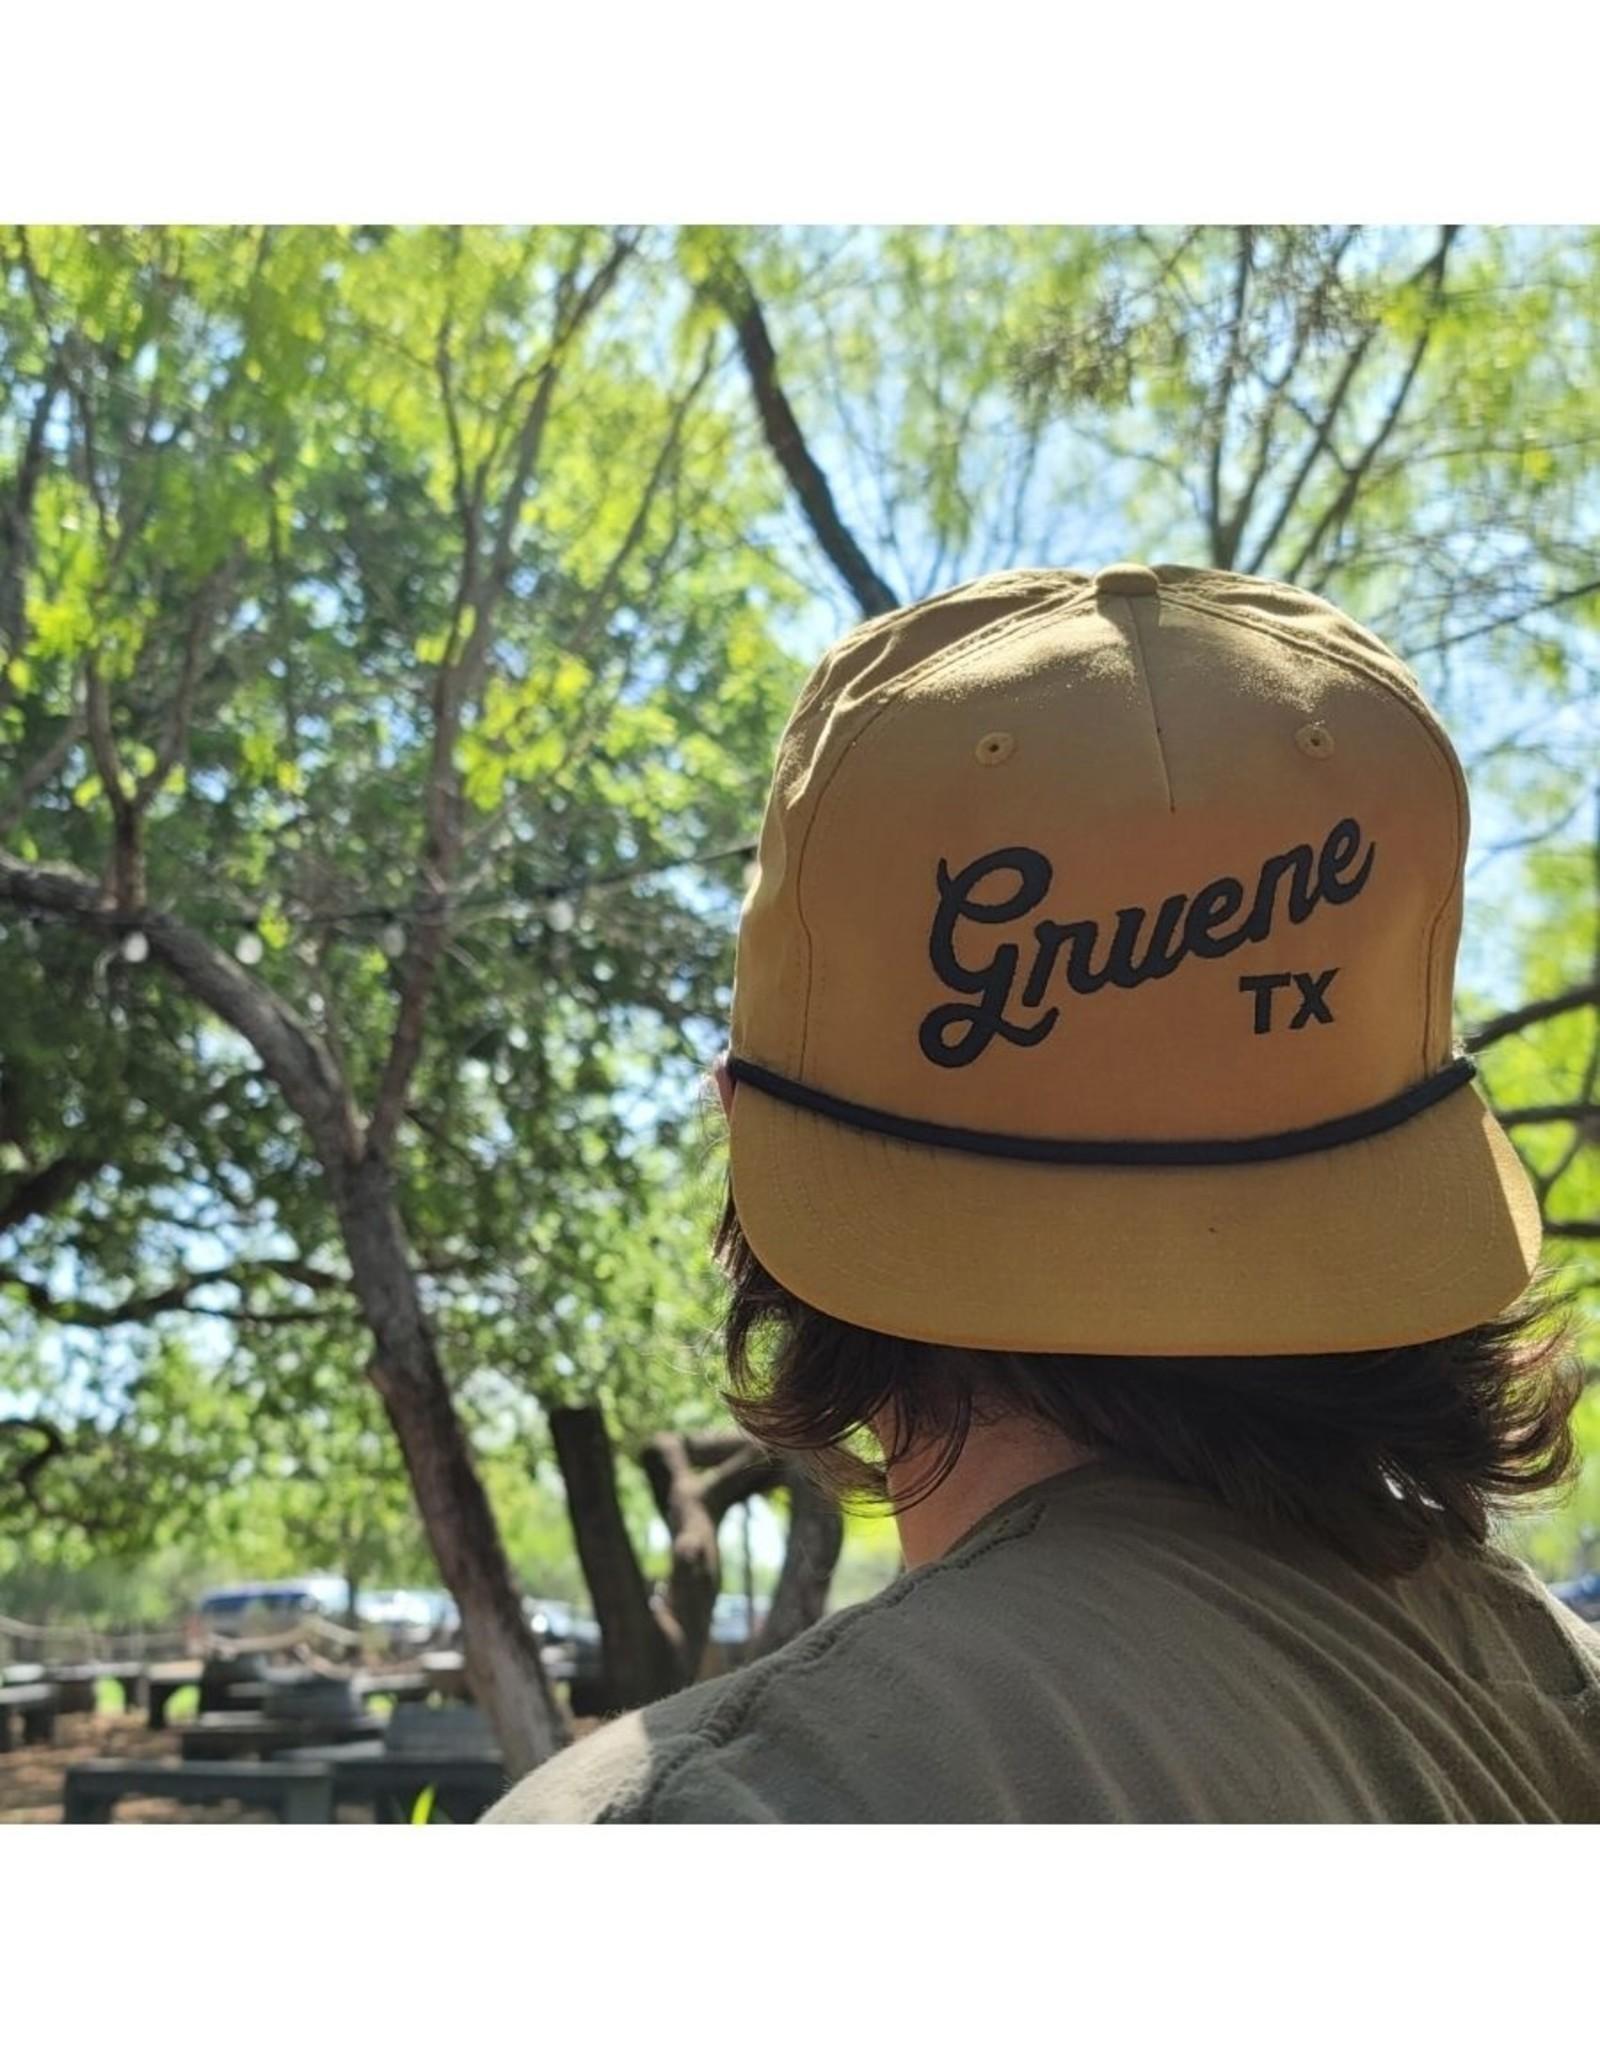 Gruene TX Rope Cap